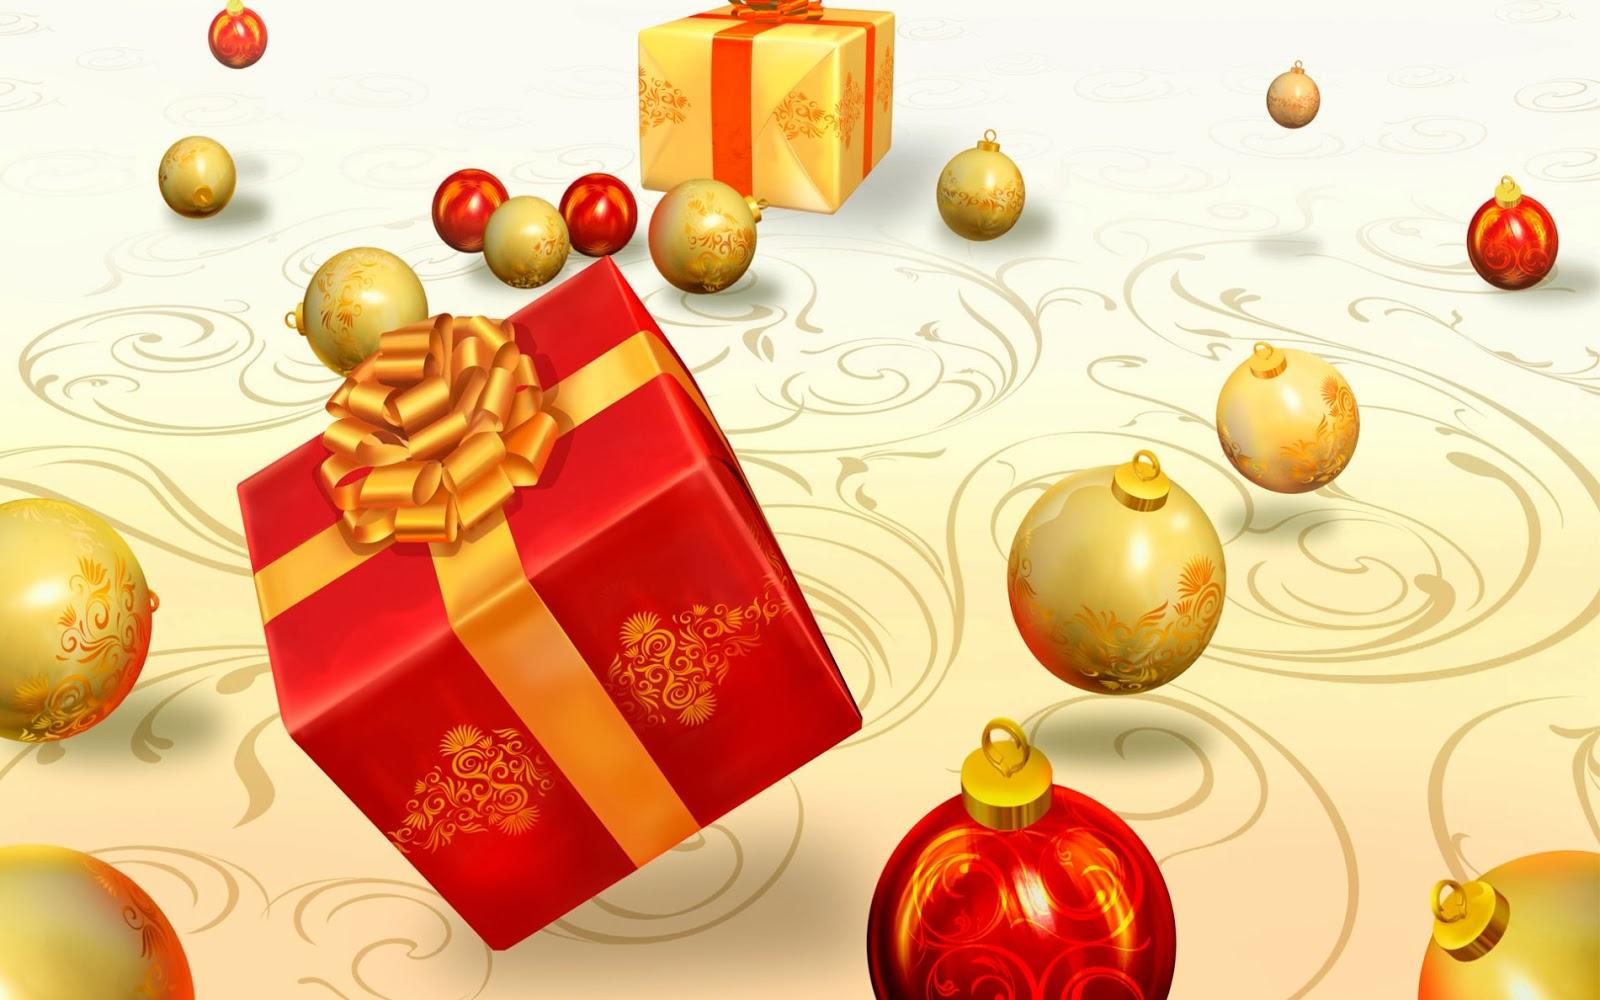 2014 happy merry christmas wallpapers - freewallpaperpk wallpaper